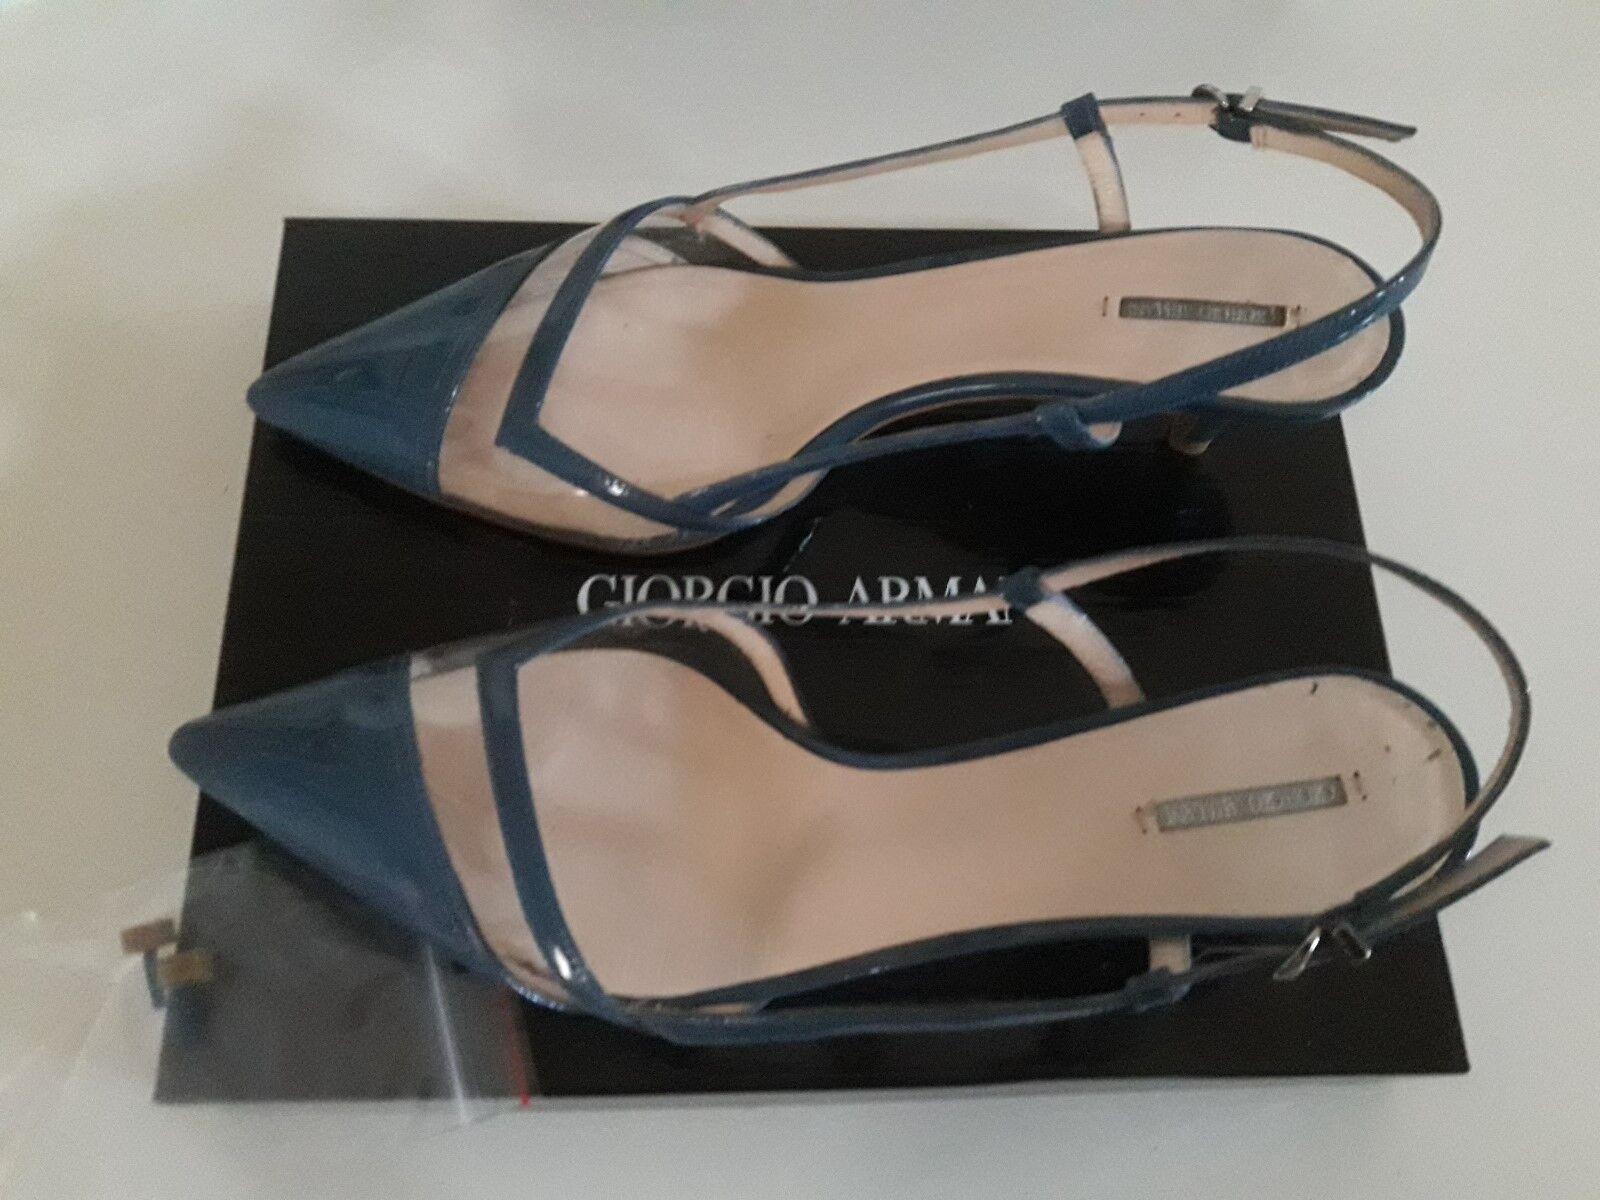 Giorgio Armani shoes Eleganti women n.39 Certificato Garanzia Imballi Originali